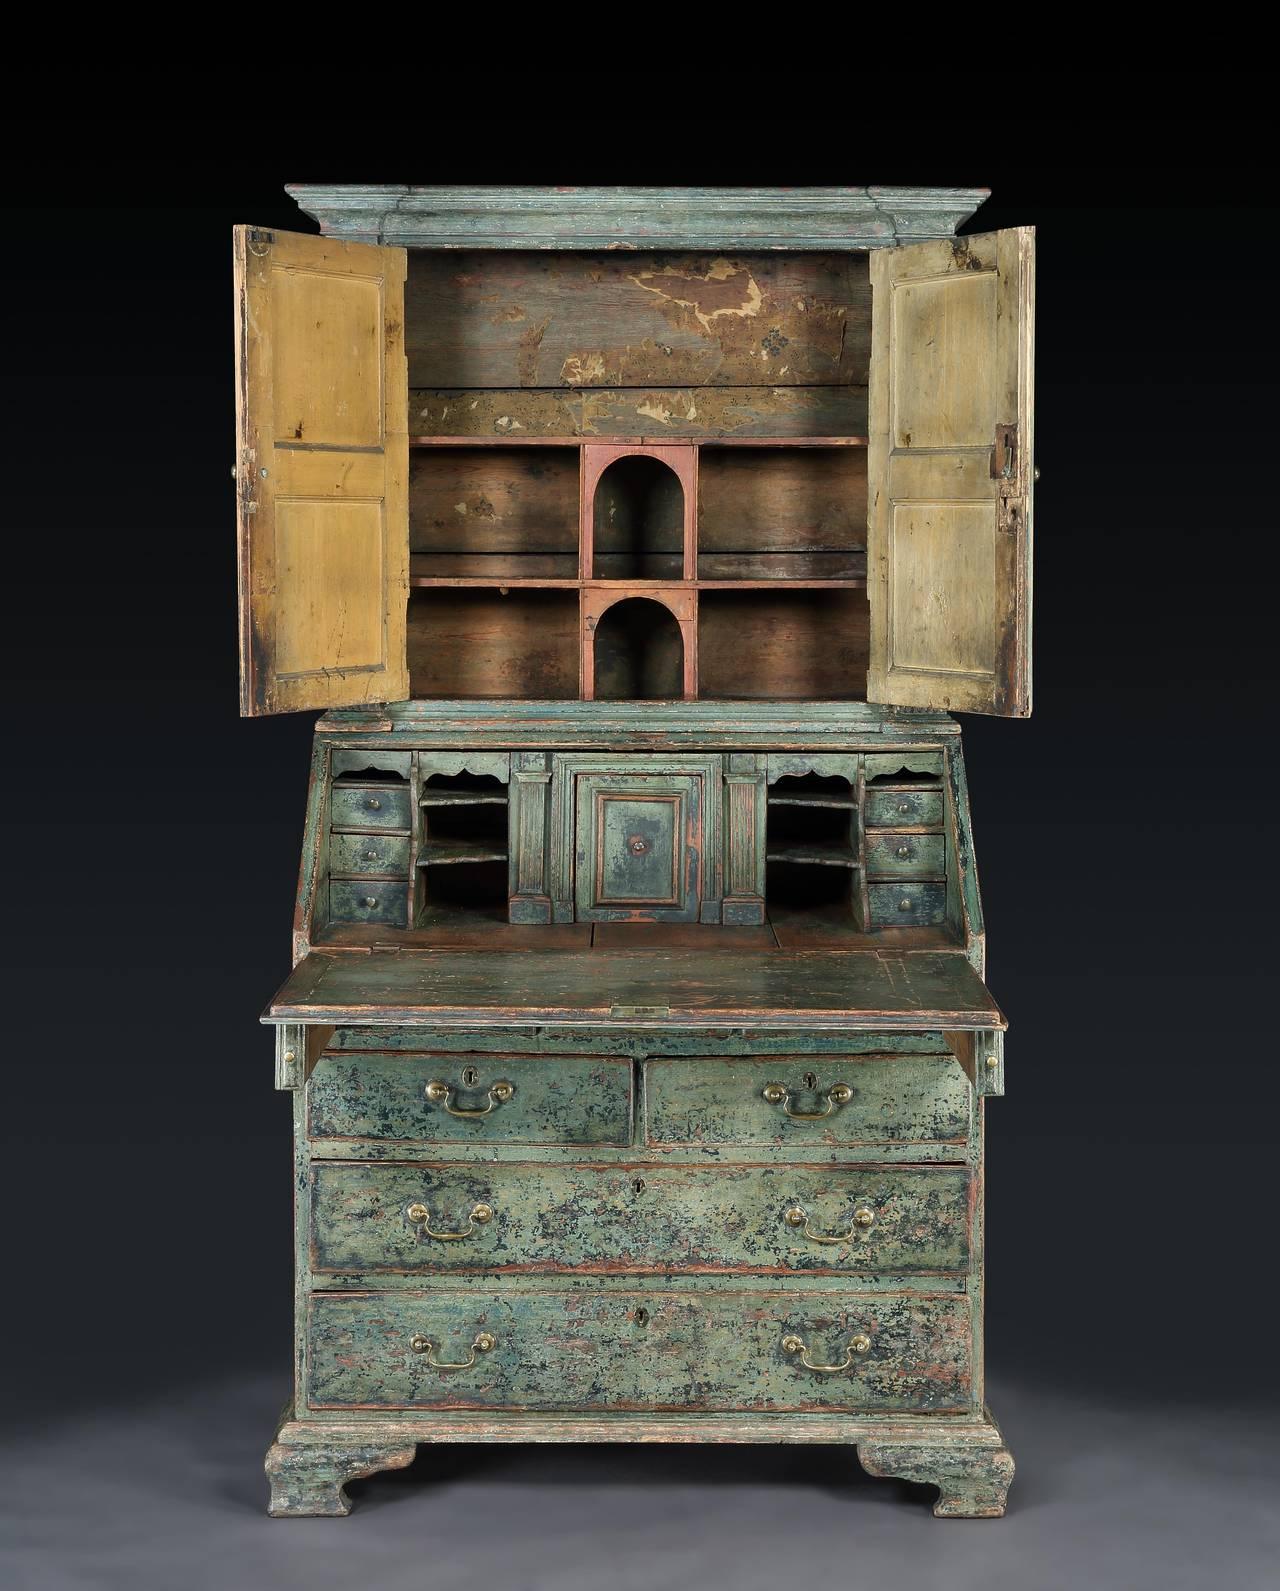 extraordinary c18th original painted bureau cabinet at 1stdibs. Black Bedroom Furniture Sets. Home Design Ideas